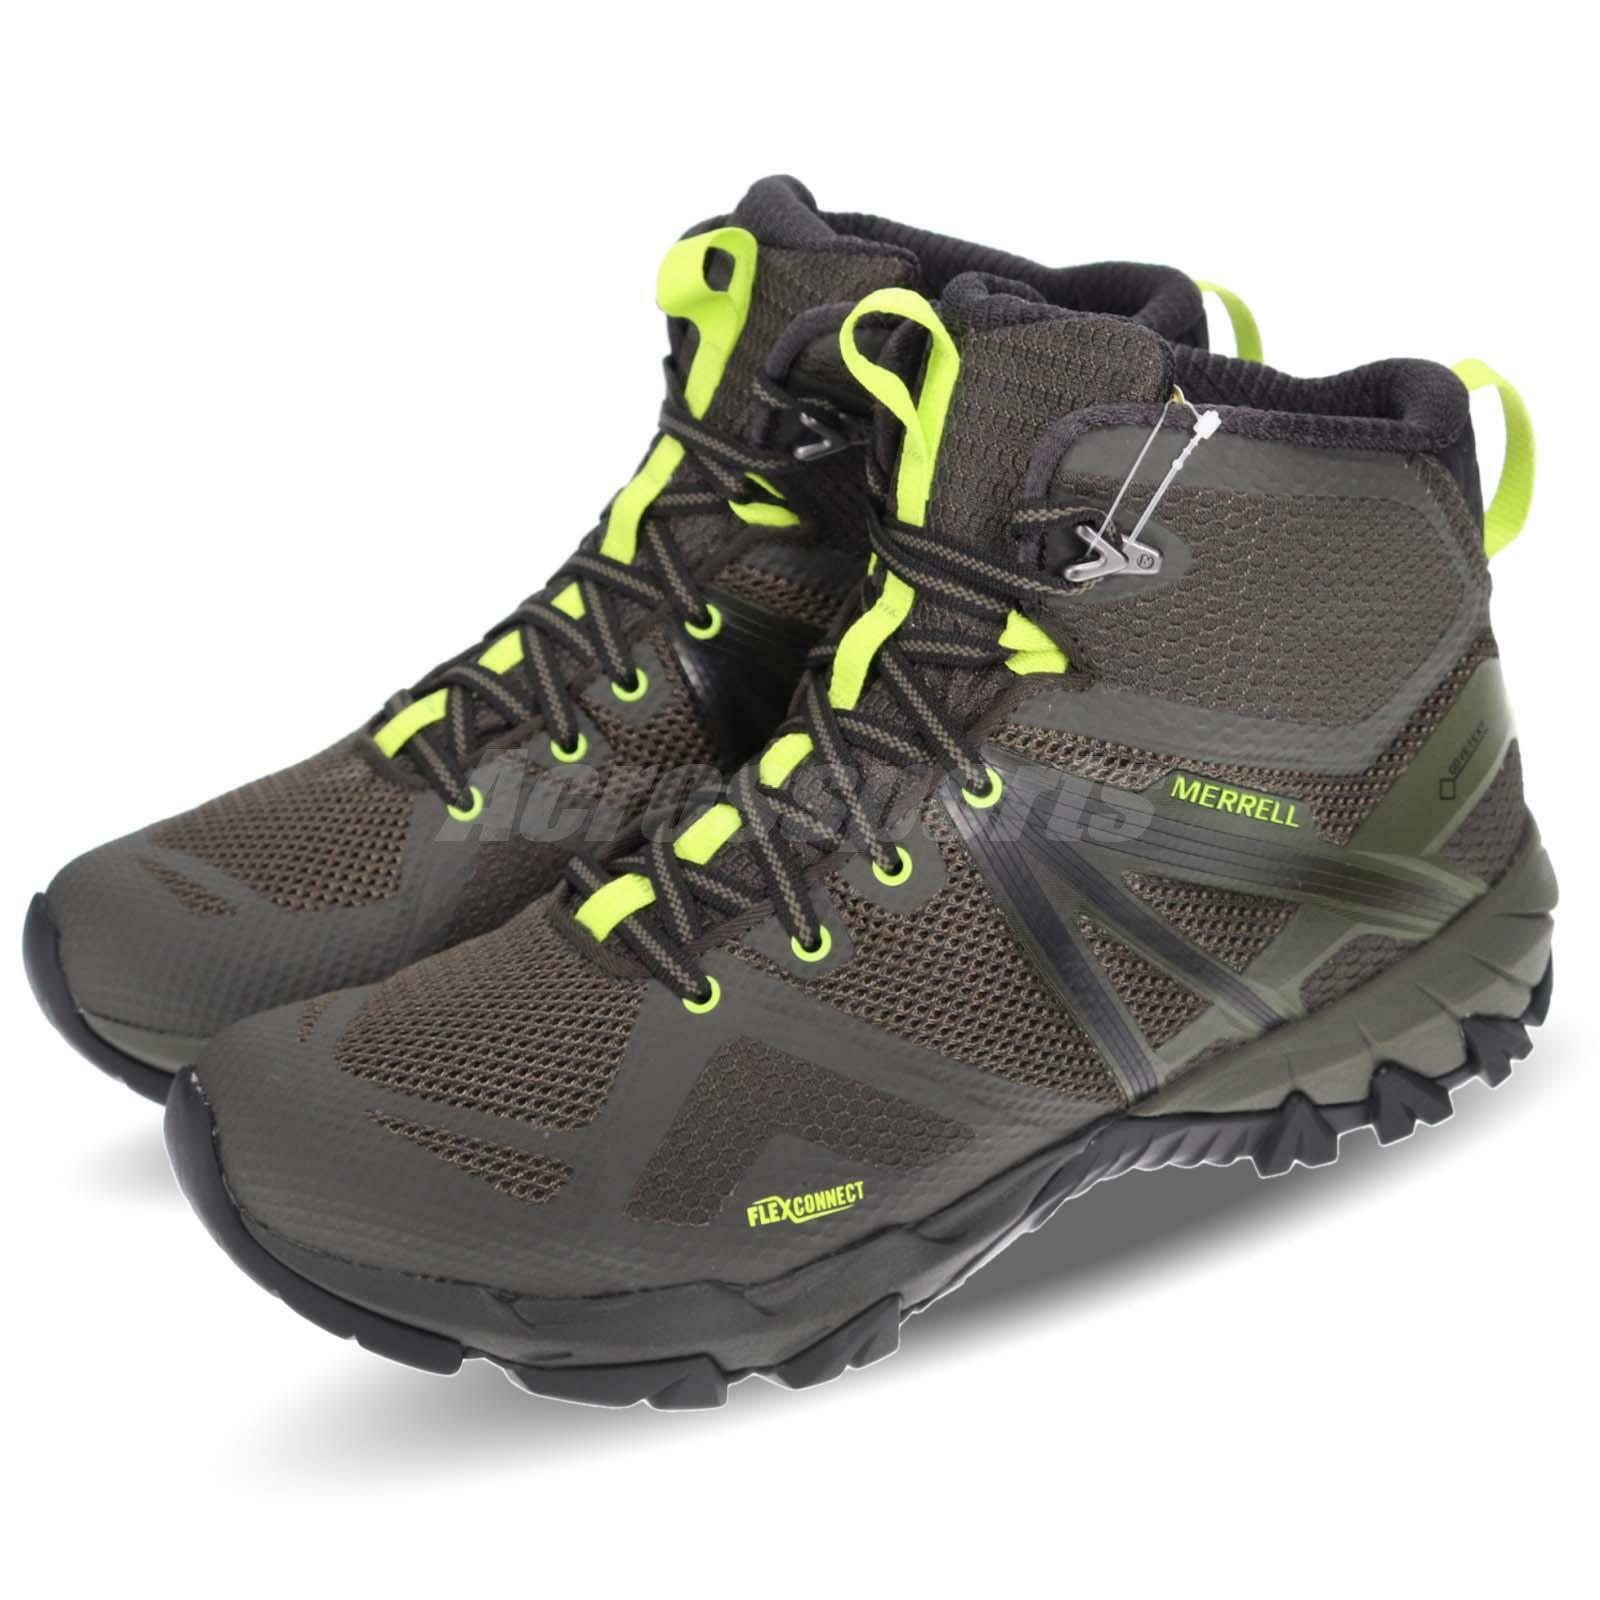 Merrell MQM Flex Mid GTX Gore-Tex Beluga Green Men Outdoors Hiking shoes J48937